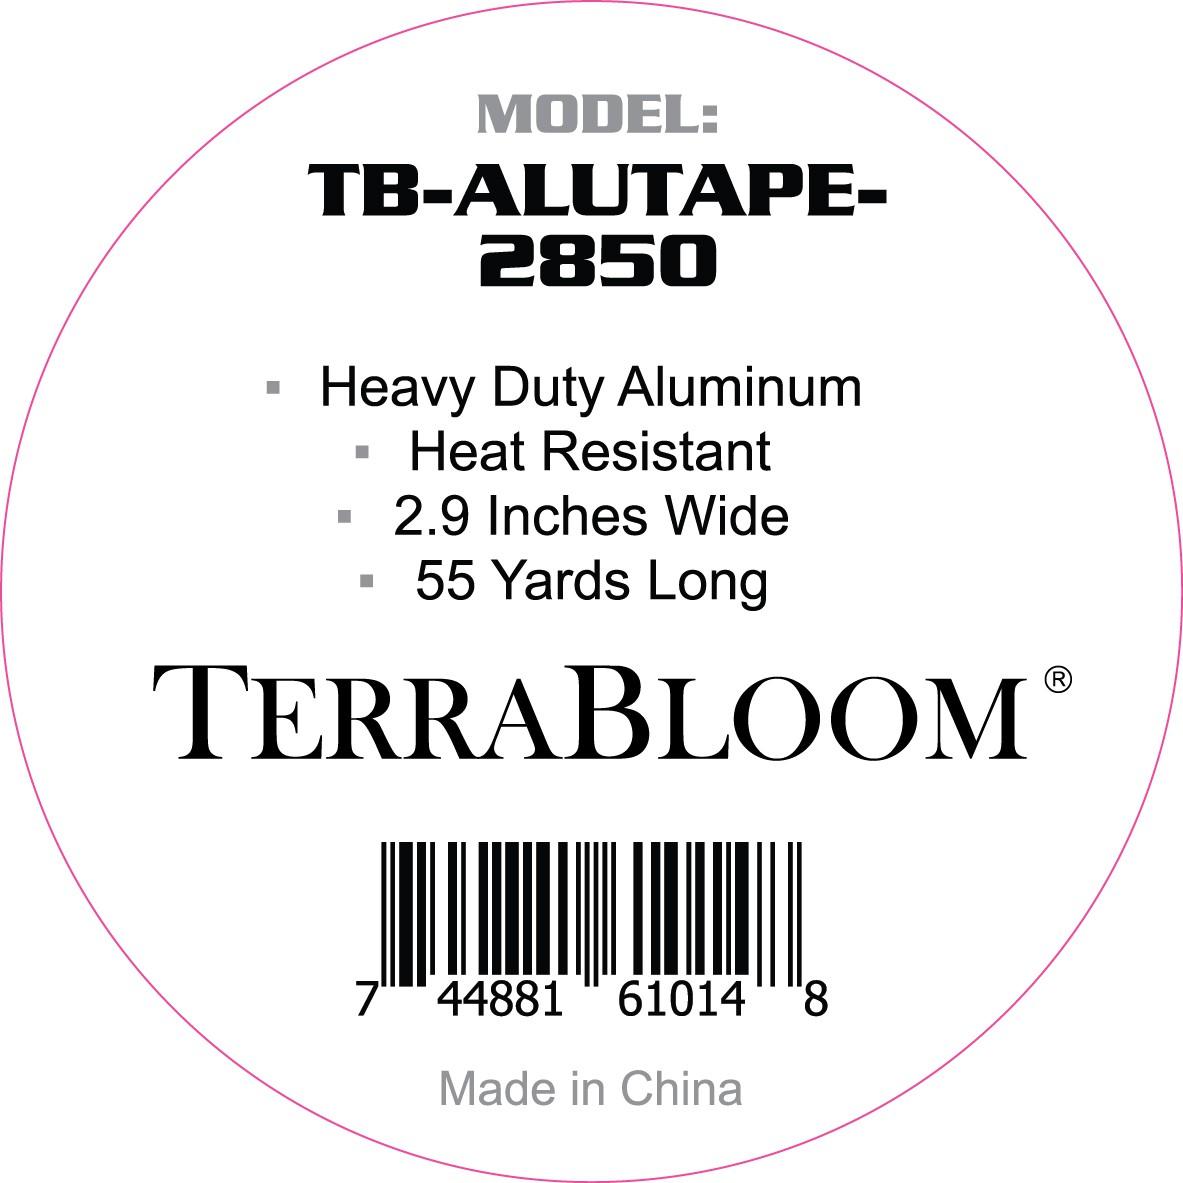 Model: TB-ALUTAPE-2850